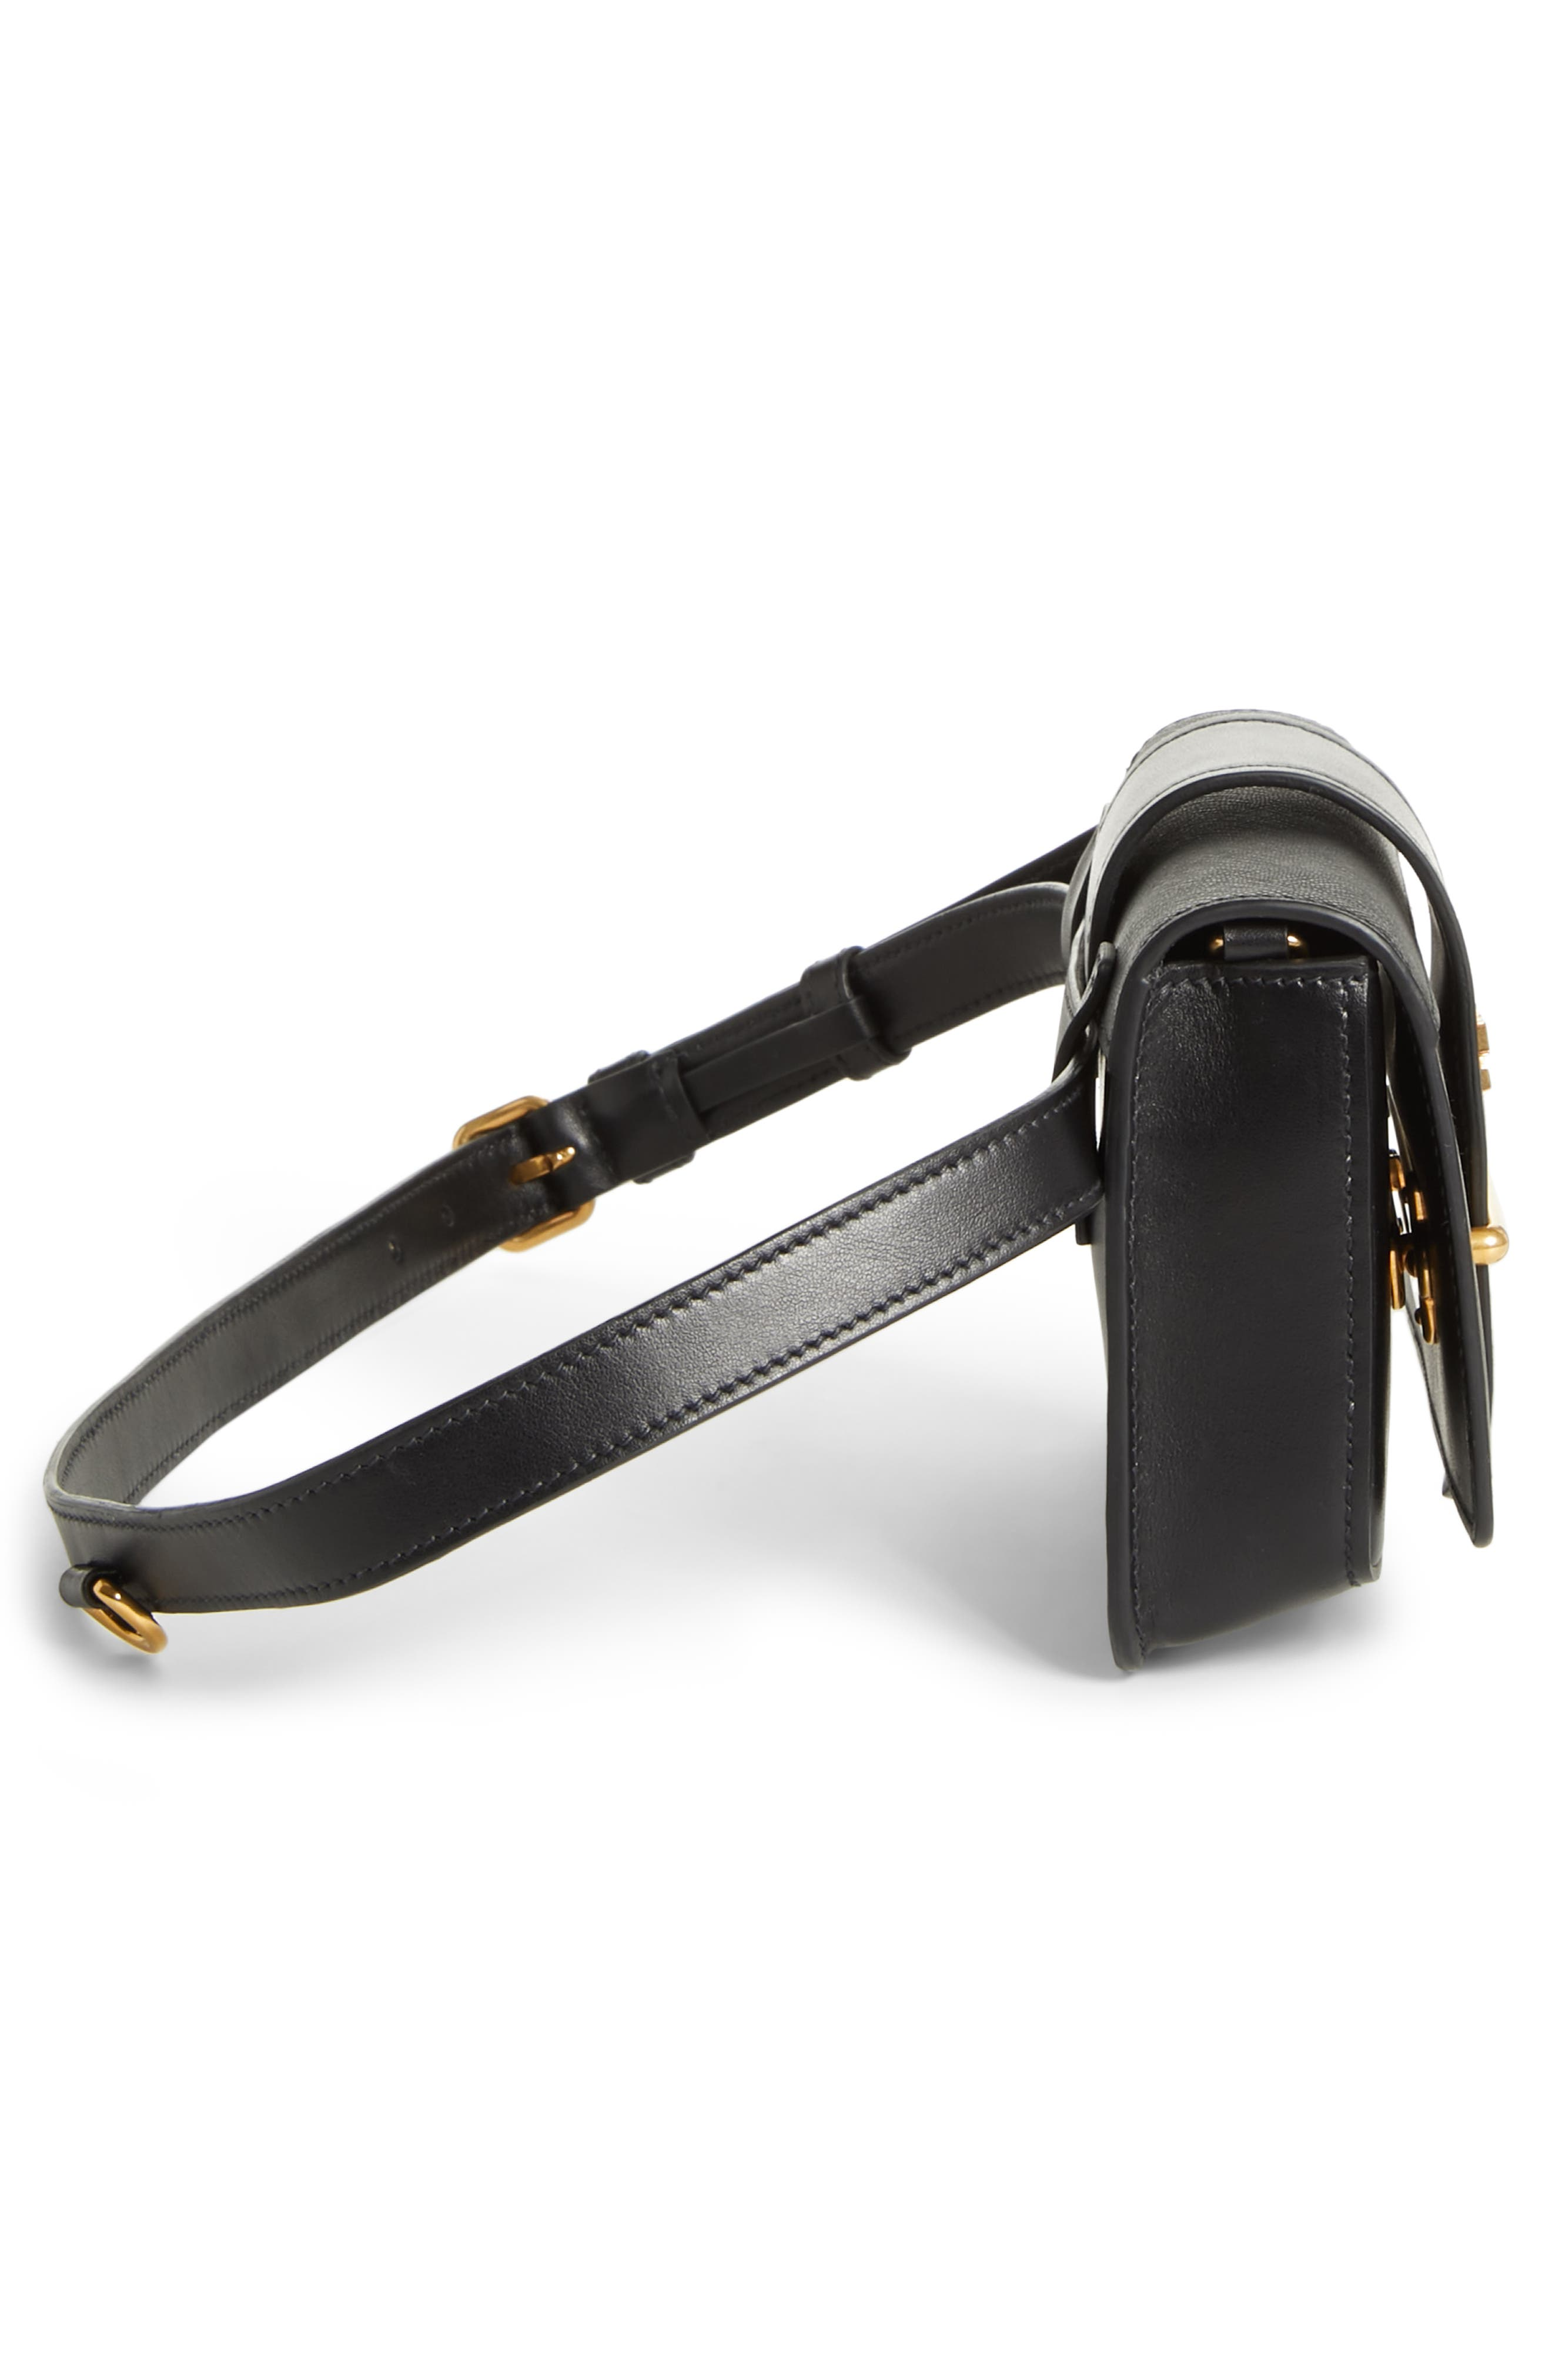 Cahier Calfskin Leather Convertible Belt Bag,                             Alternate thumbnail 2, color,                             001